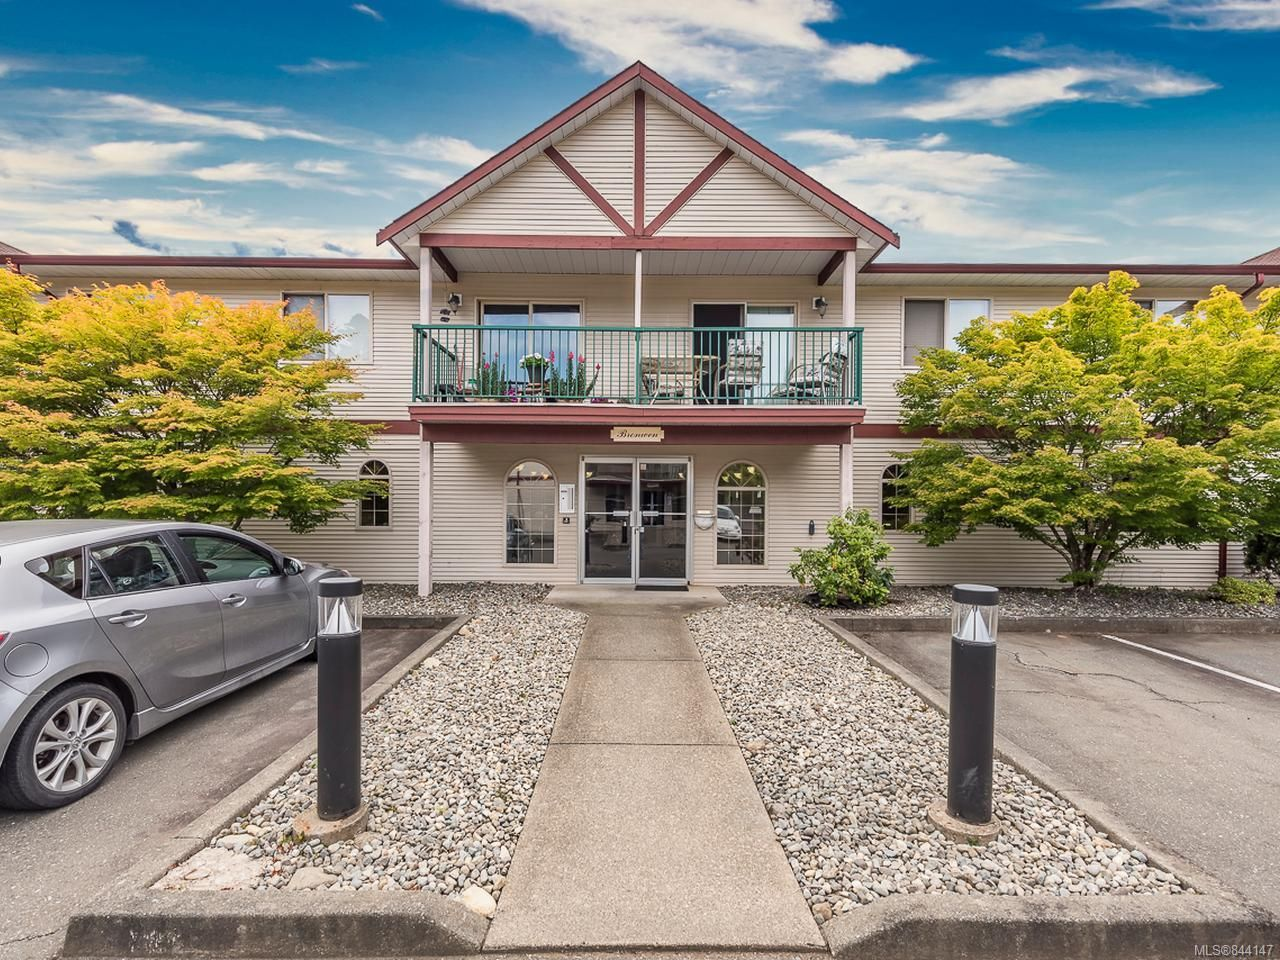 Main Photo: 215 1450 Tunner Dr in COURTENAY: CV Courtenay East Condo for sale (Comox Valley)  : MLS®# 844147